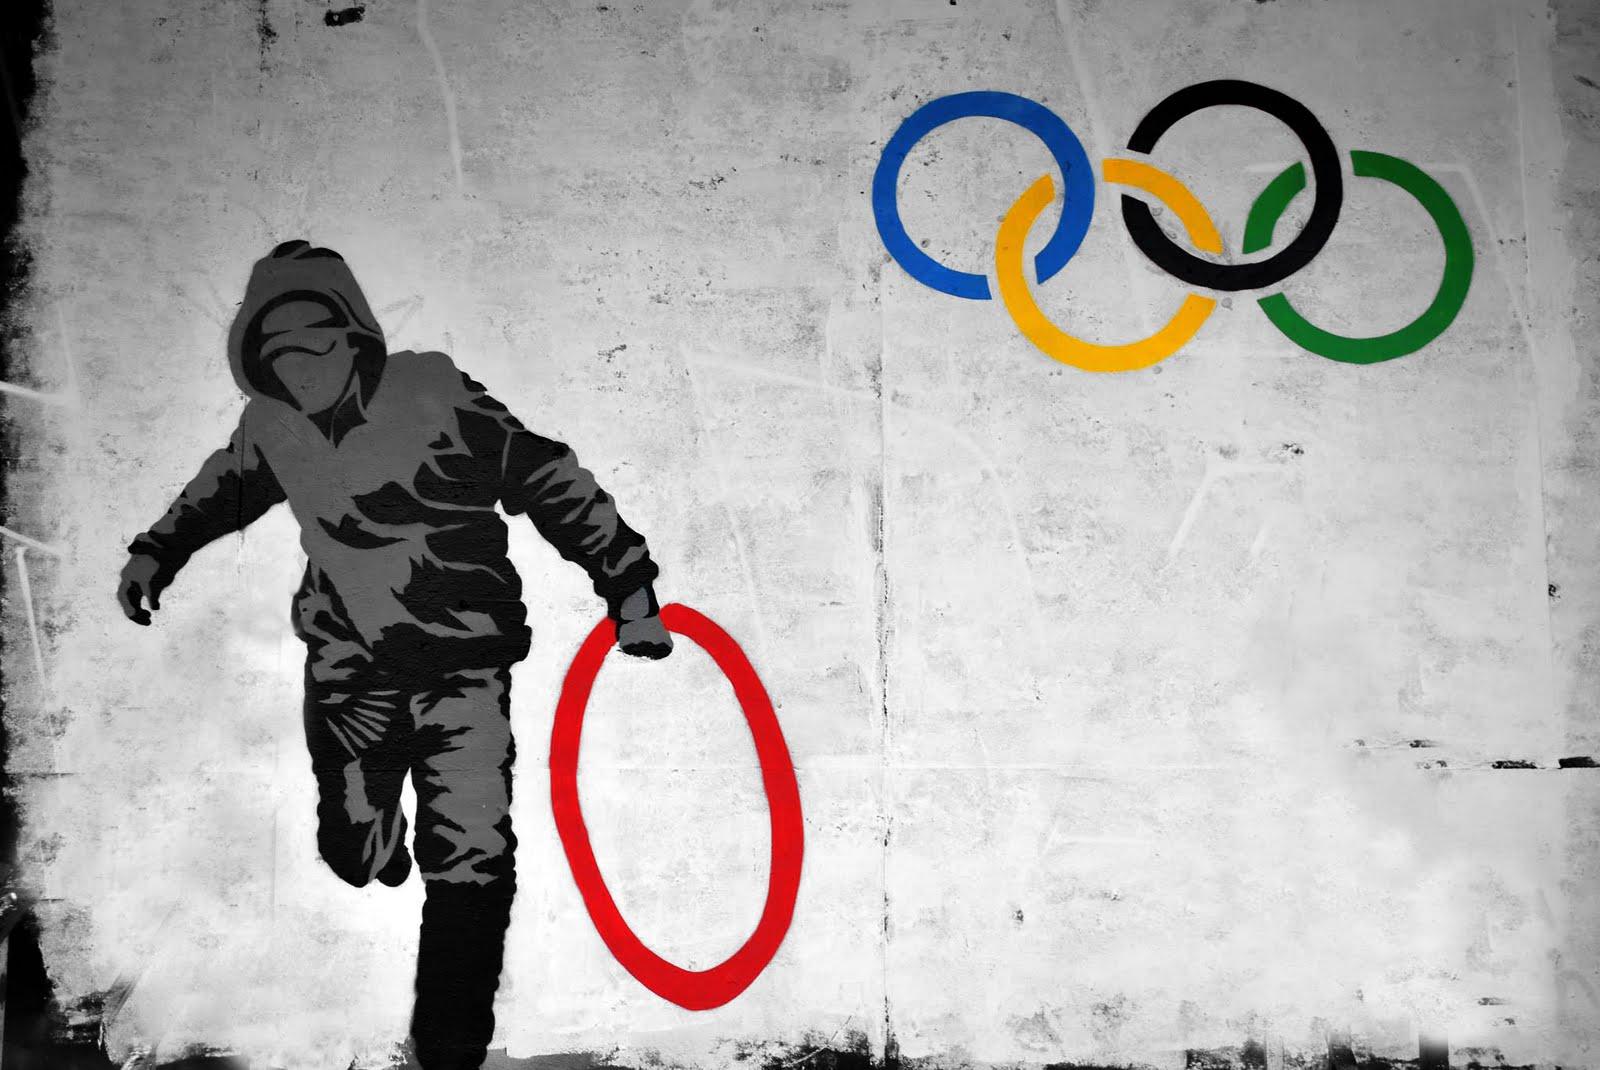 olimpiafoto.jpg